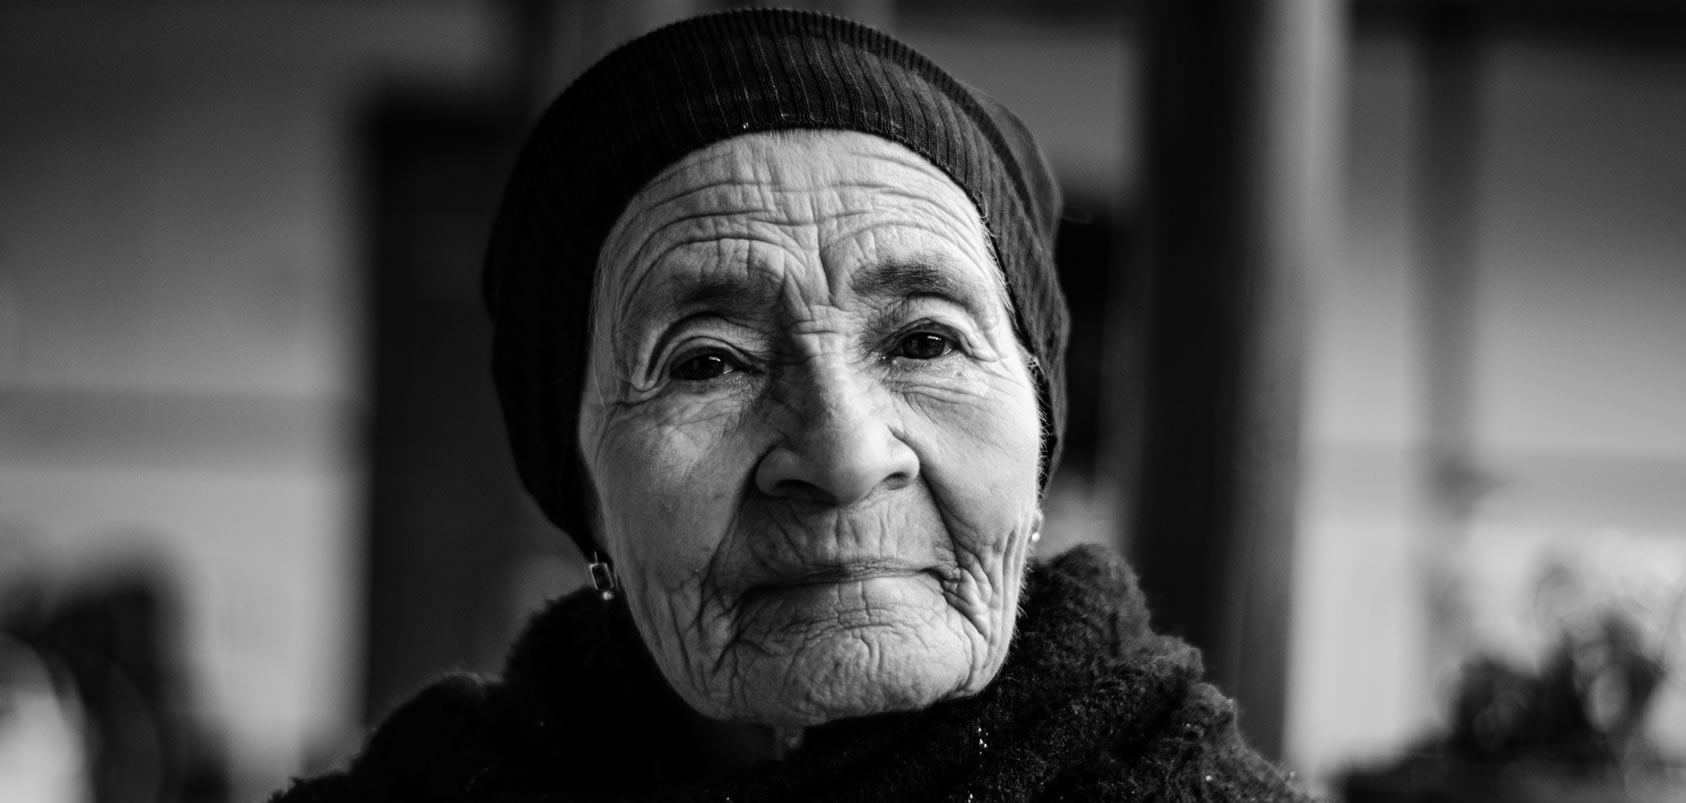 Retratos: Diez charlas con ancianos antioqueños en un asilo de Sonsón